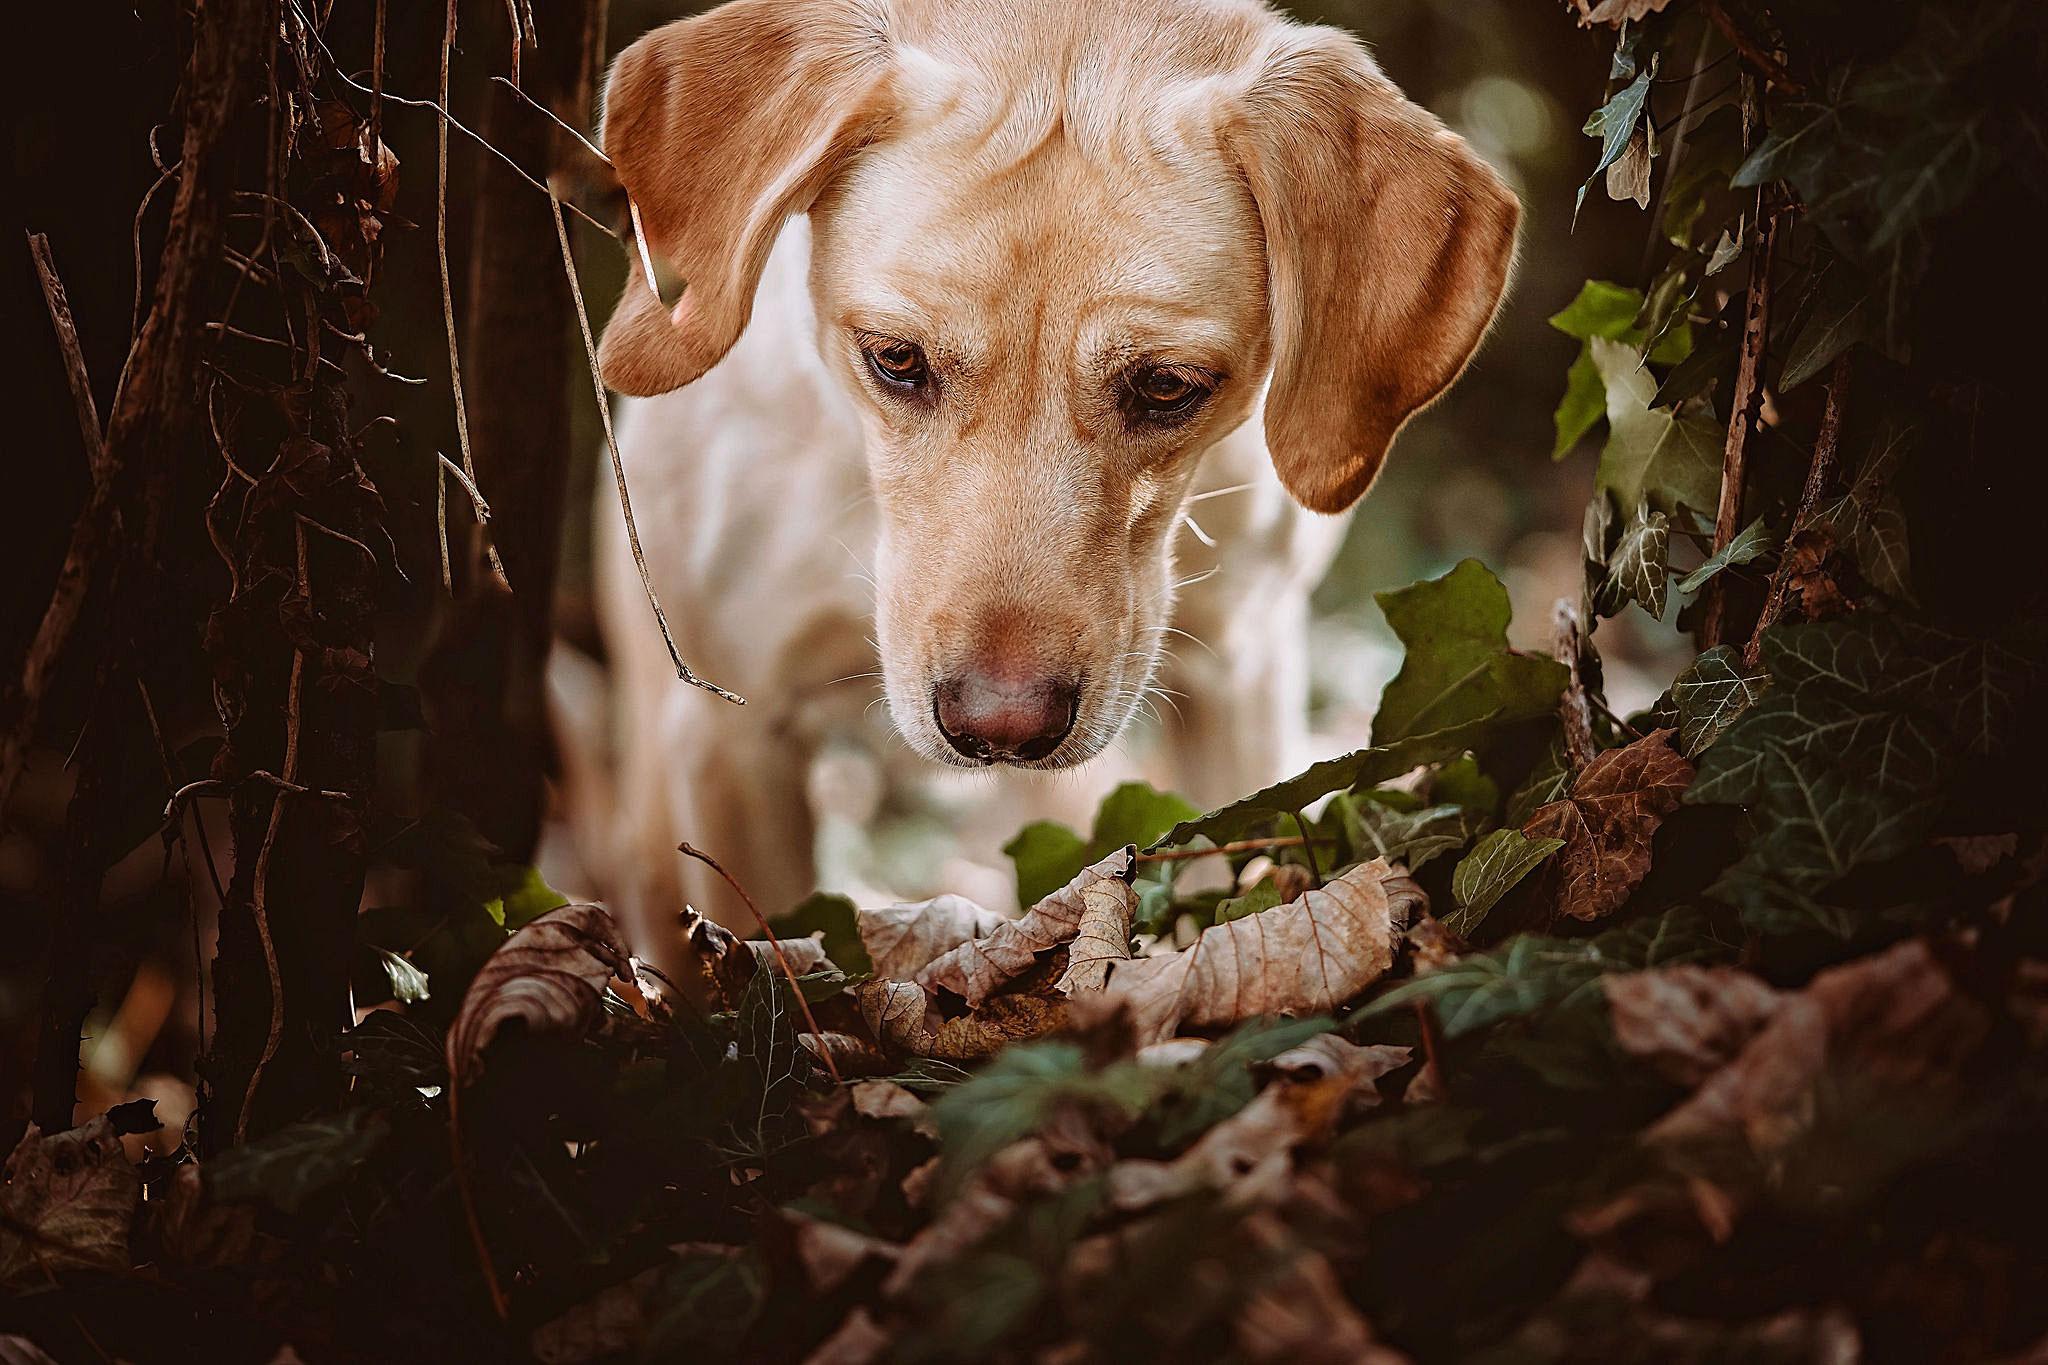 Sussex pet photographer